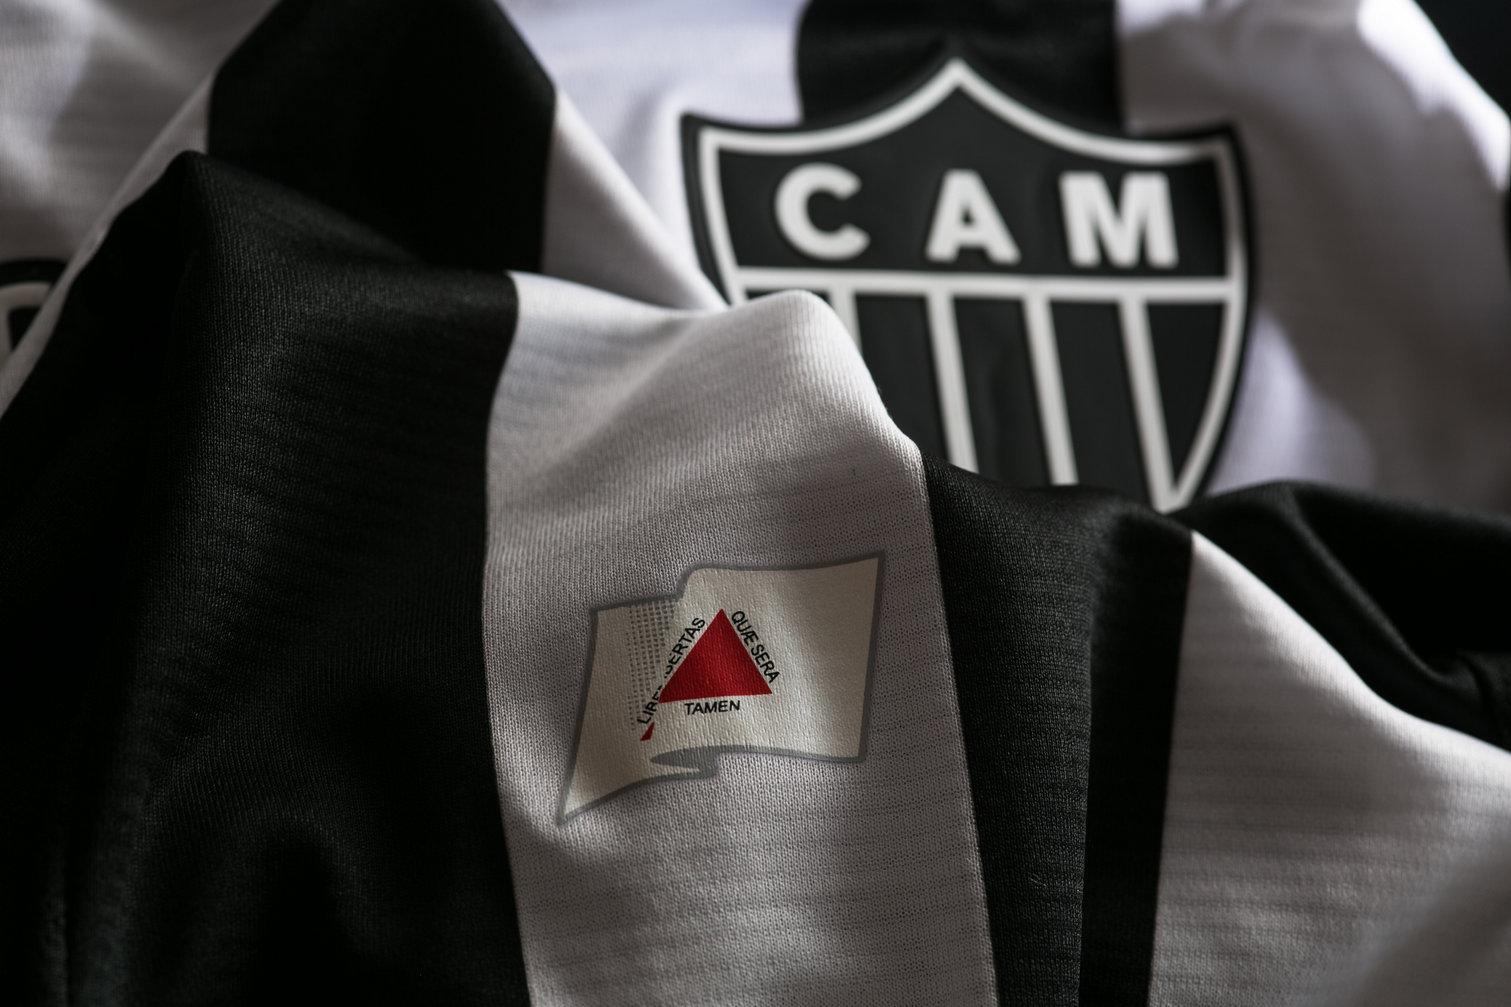 Camiseta titular 2018 del Atlético Mineiro | Imagen Gentileza Topper